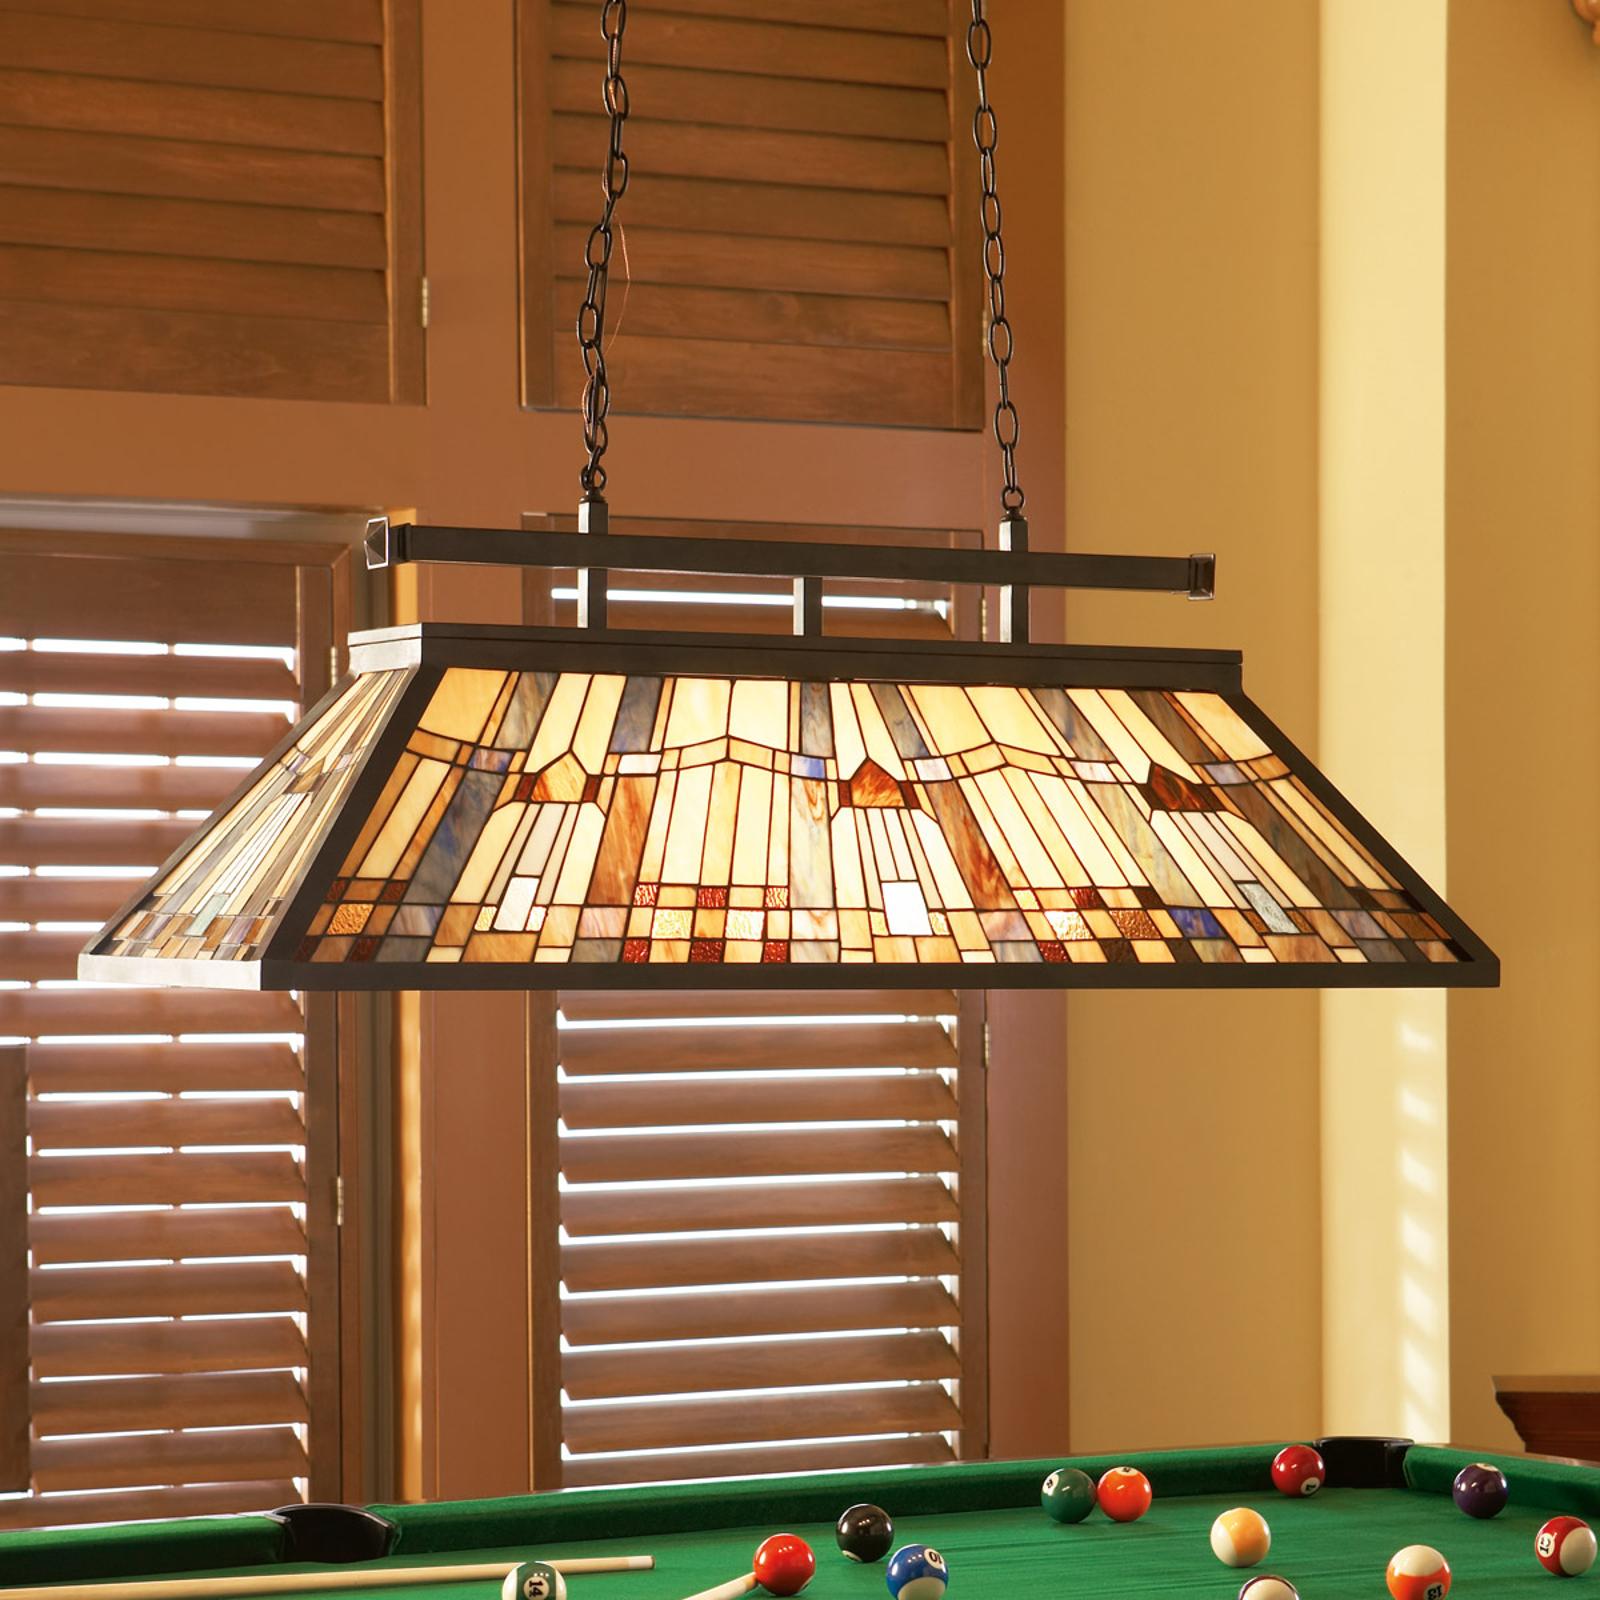 Hanglamp Inglenook met bont glas, L 121 cm